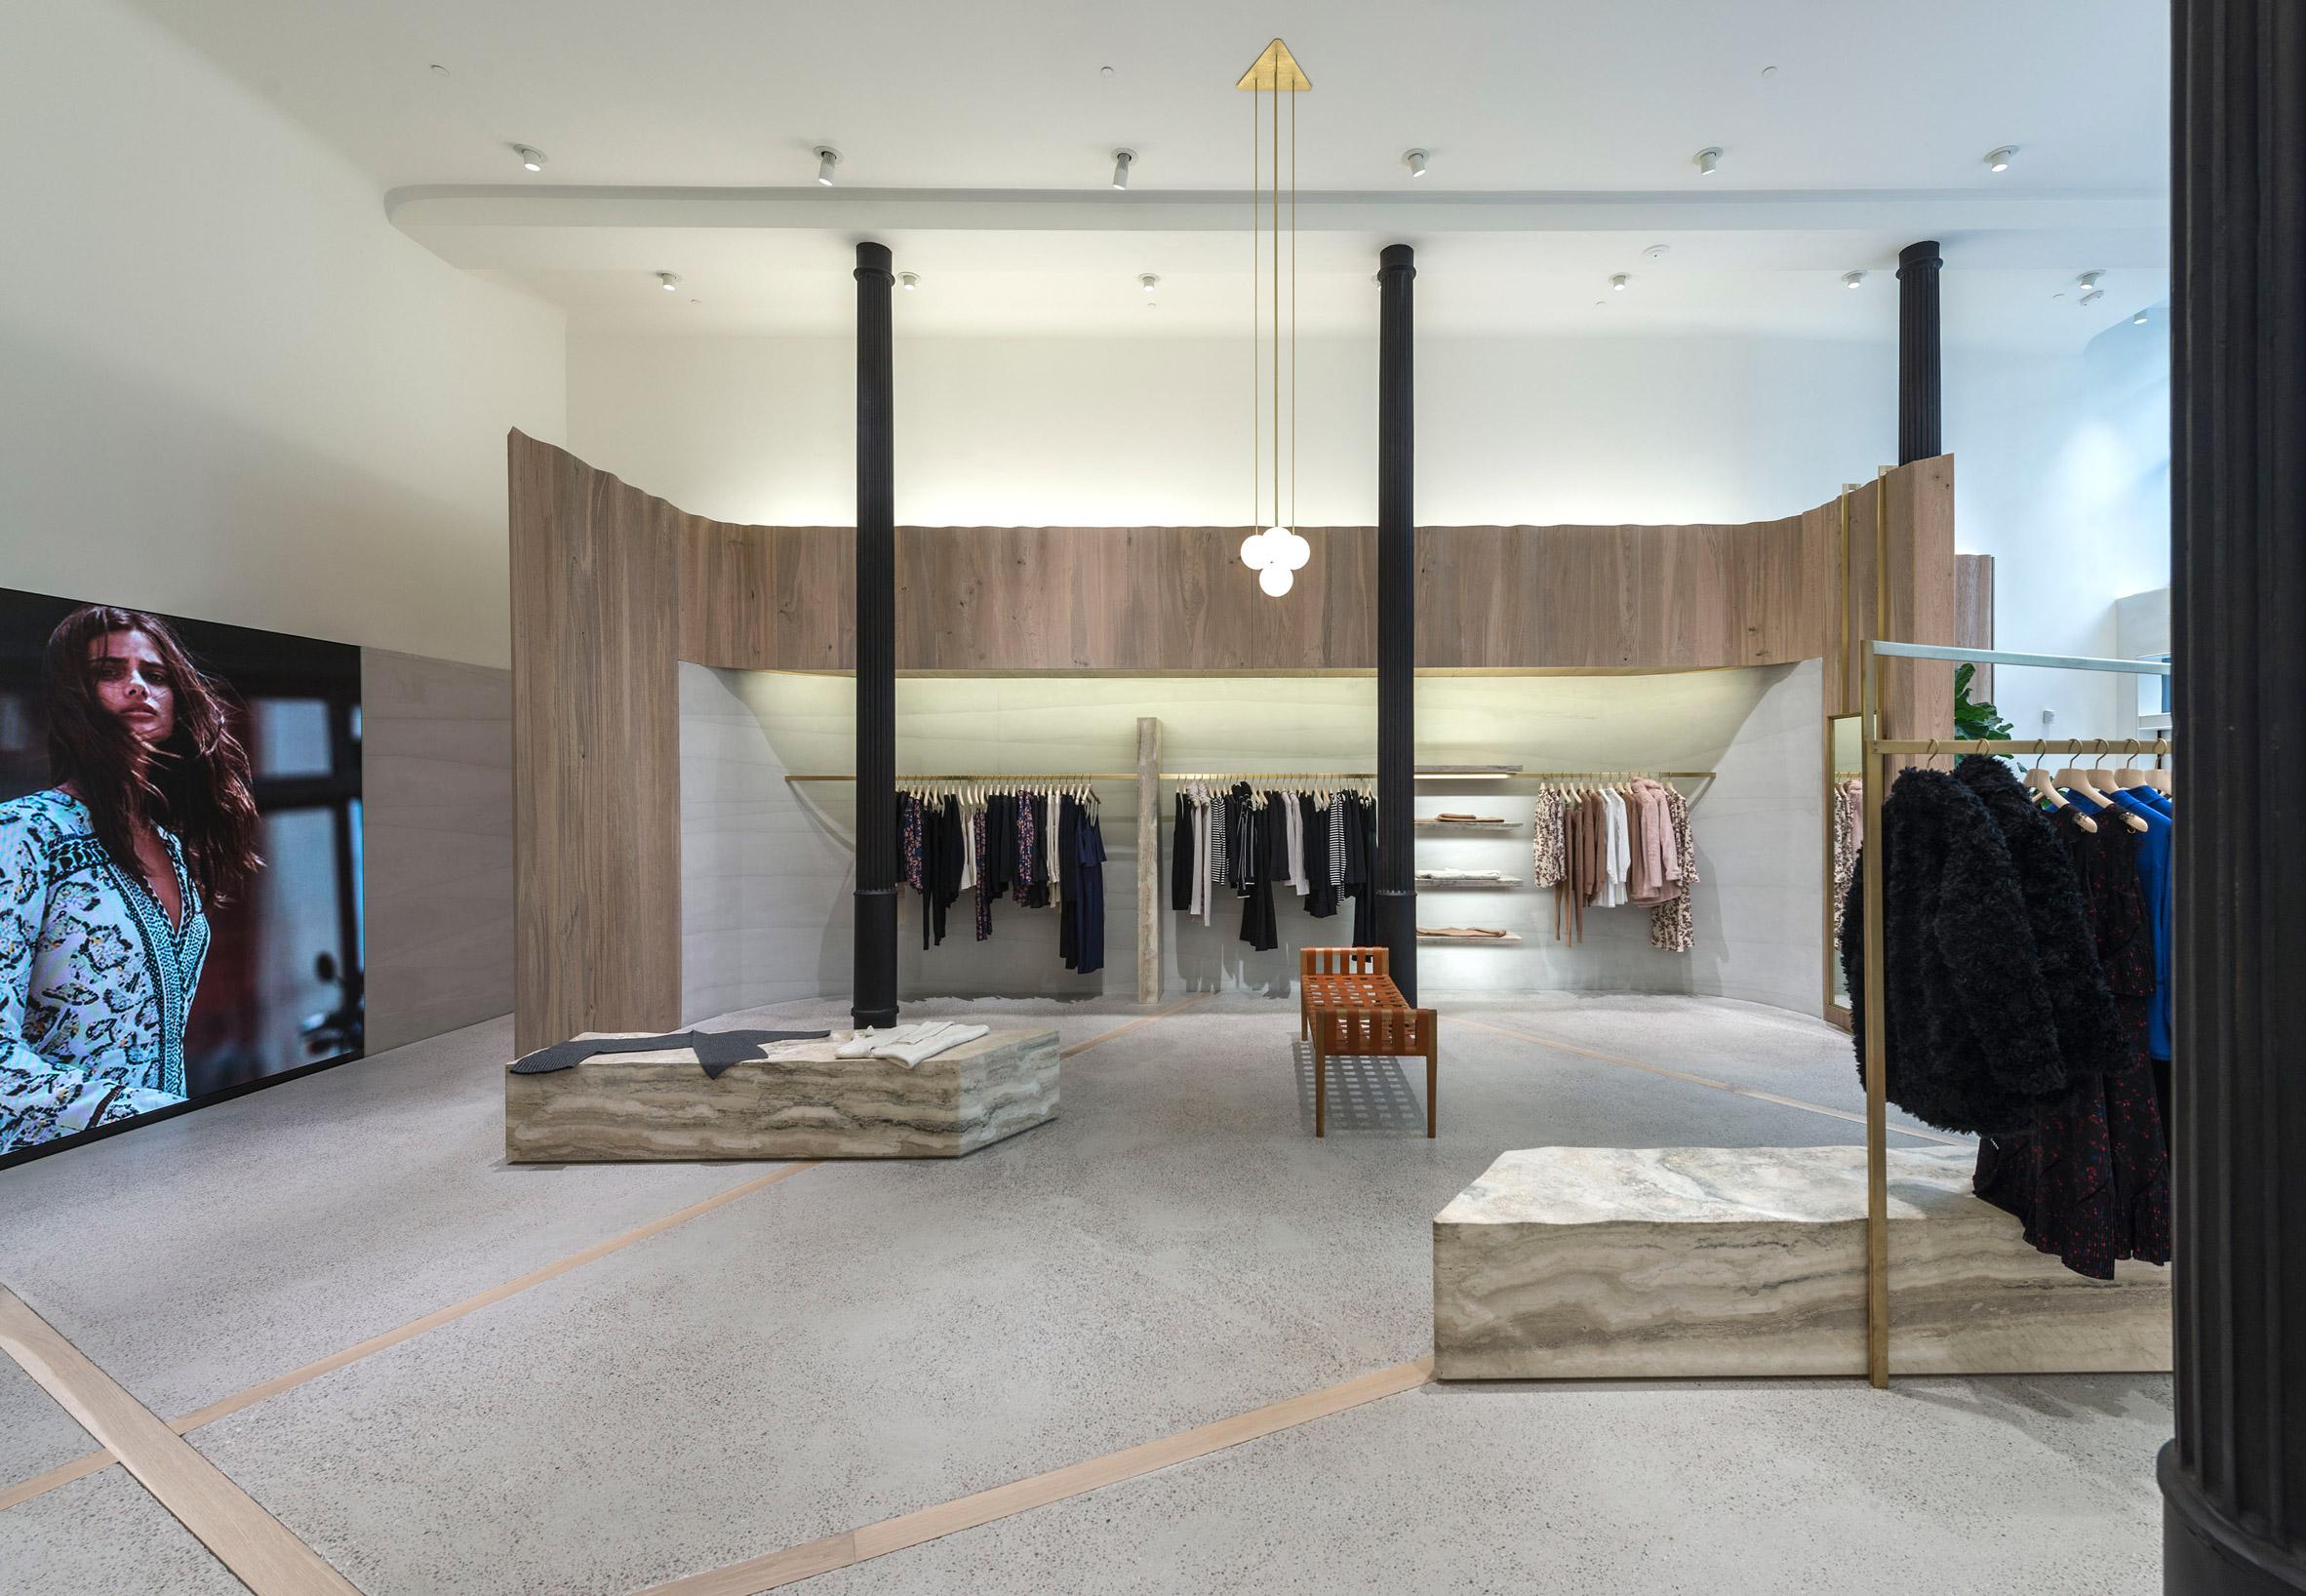 thakoon-ny-avra-madison-fashion-retail-store-shop-interior-design-fernando-mastrangelo-new-york-city-usa_dezeen_2364_col_7